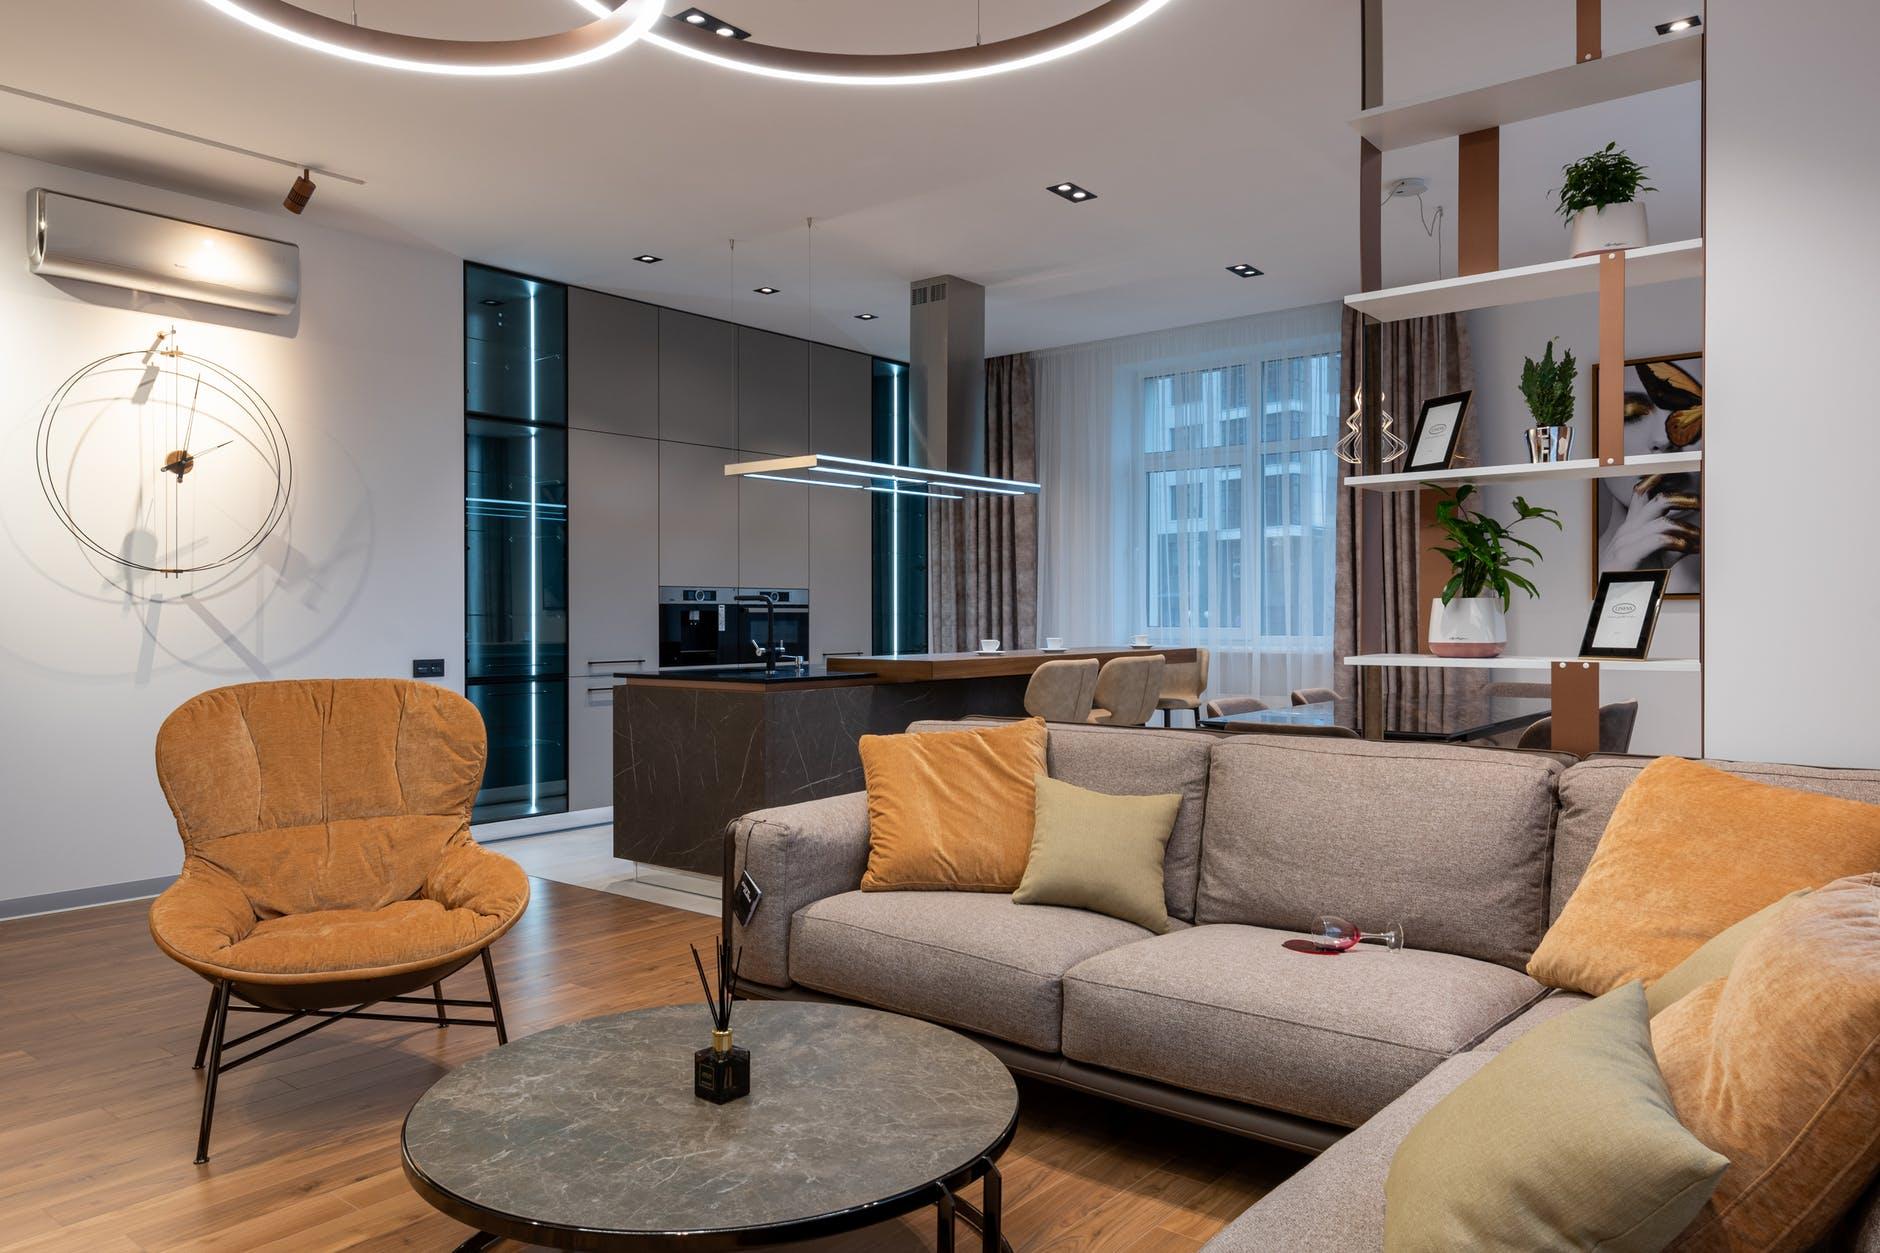 bright modern room interior in studio